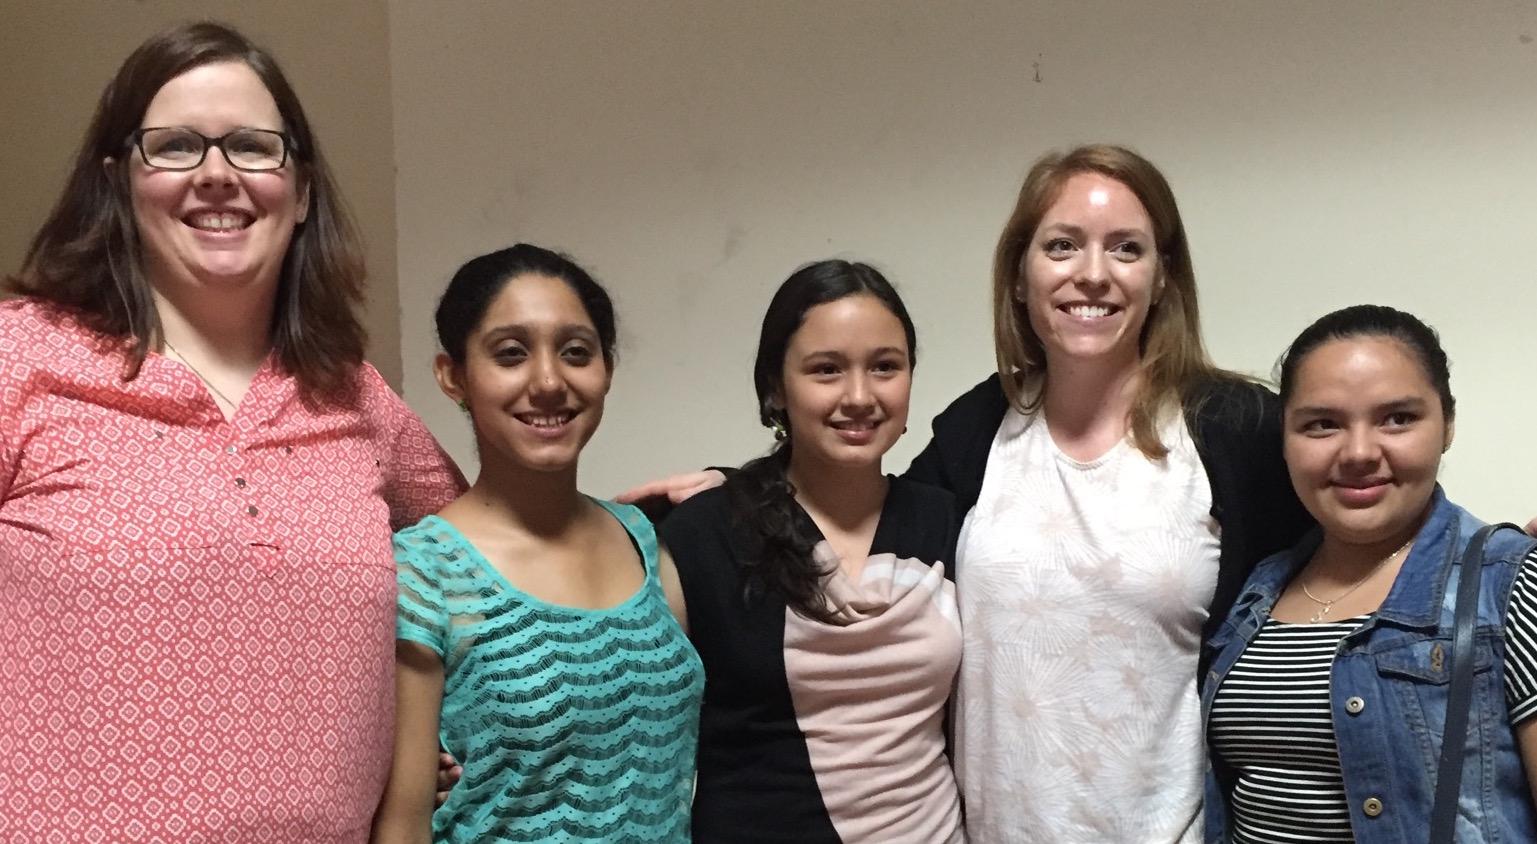 From left to right:Heather, Kimberly, Ana, Chloe, and Sara. Kimberly, Ana, and Sara were three of our valued translators!